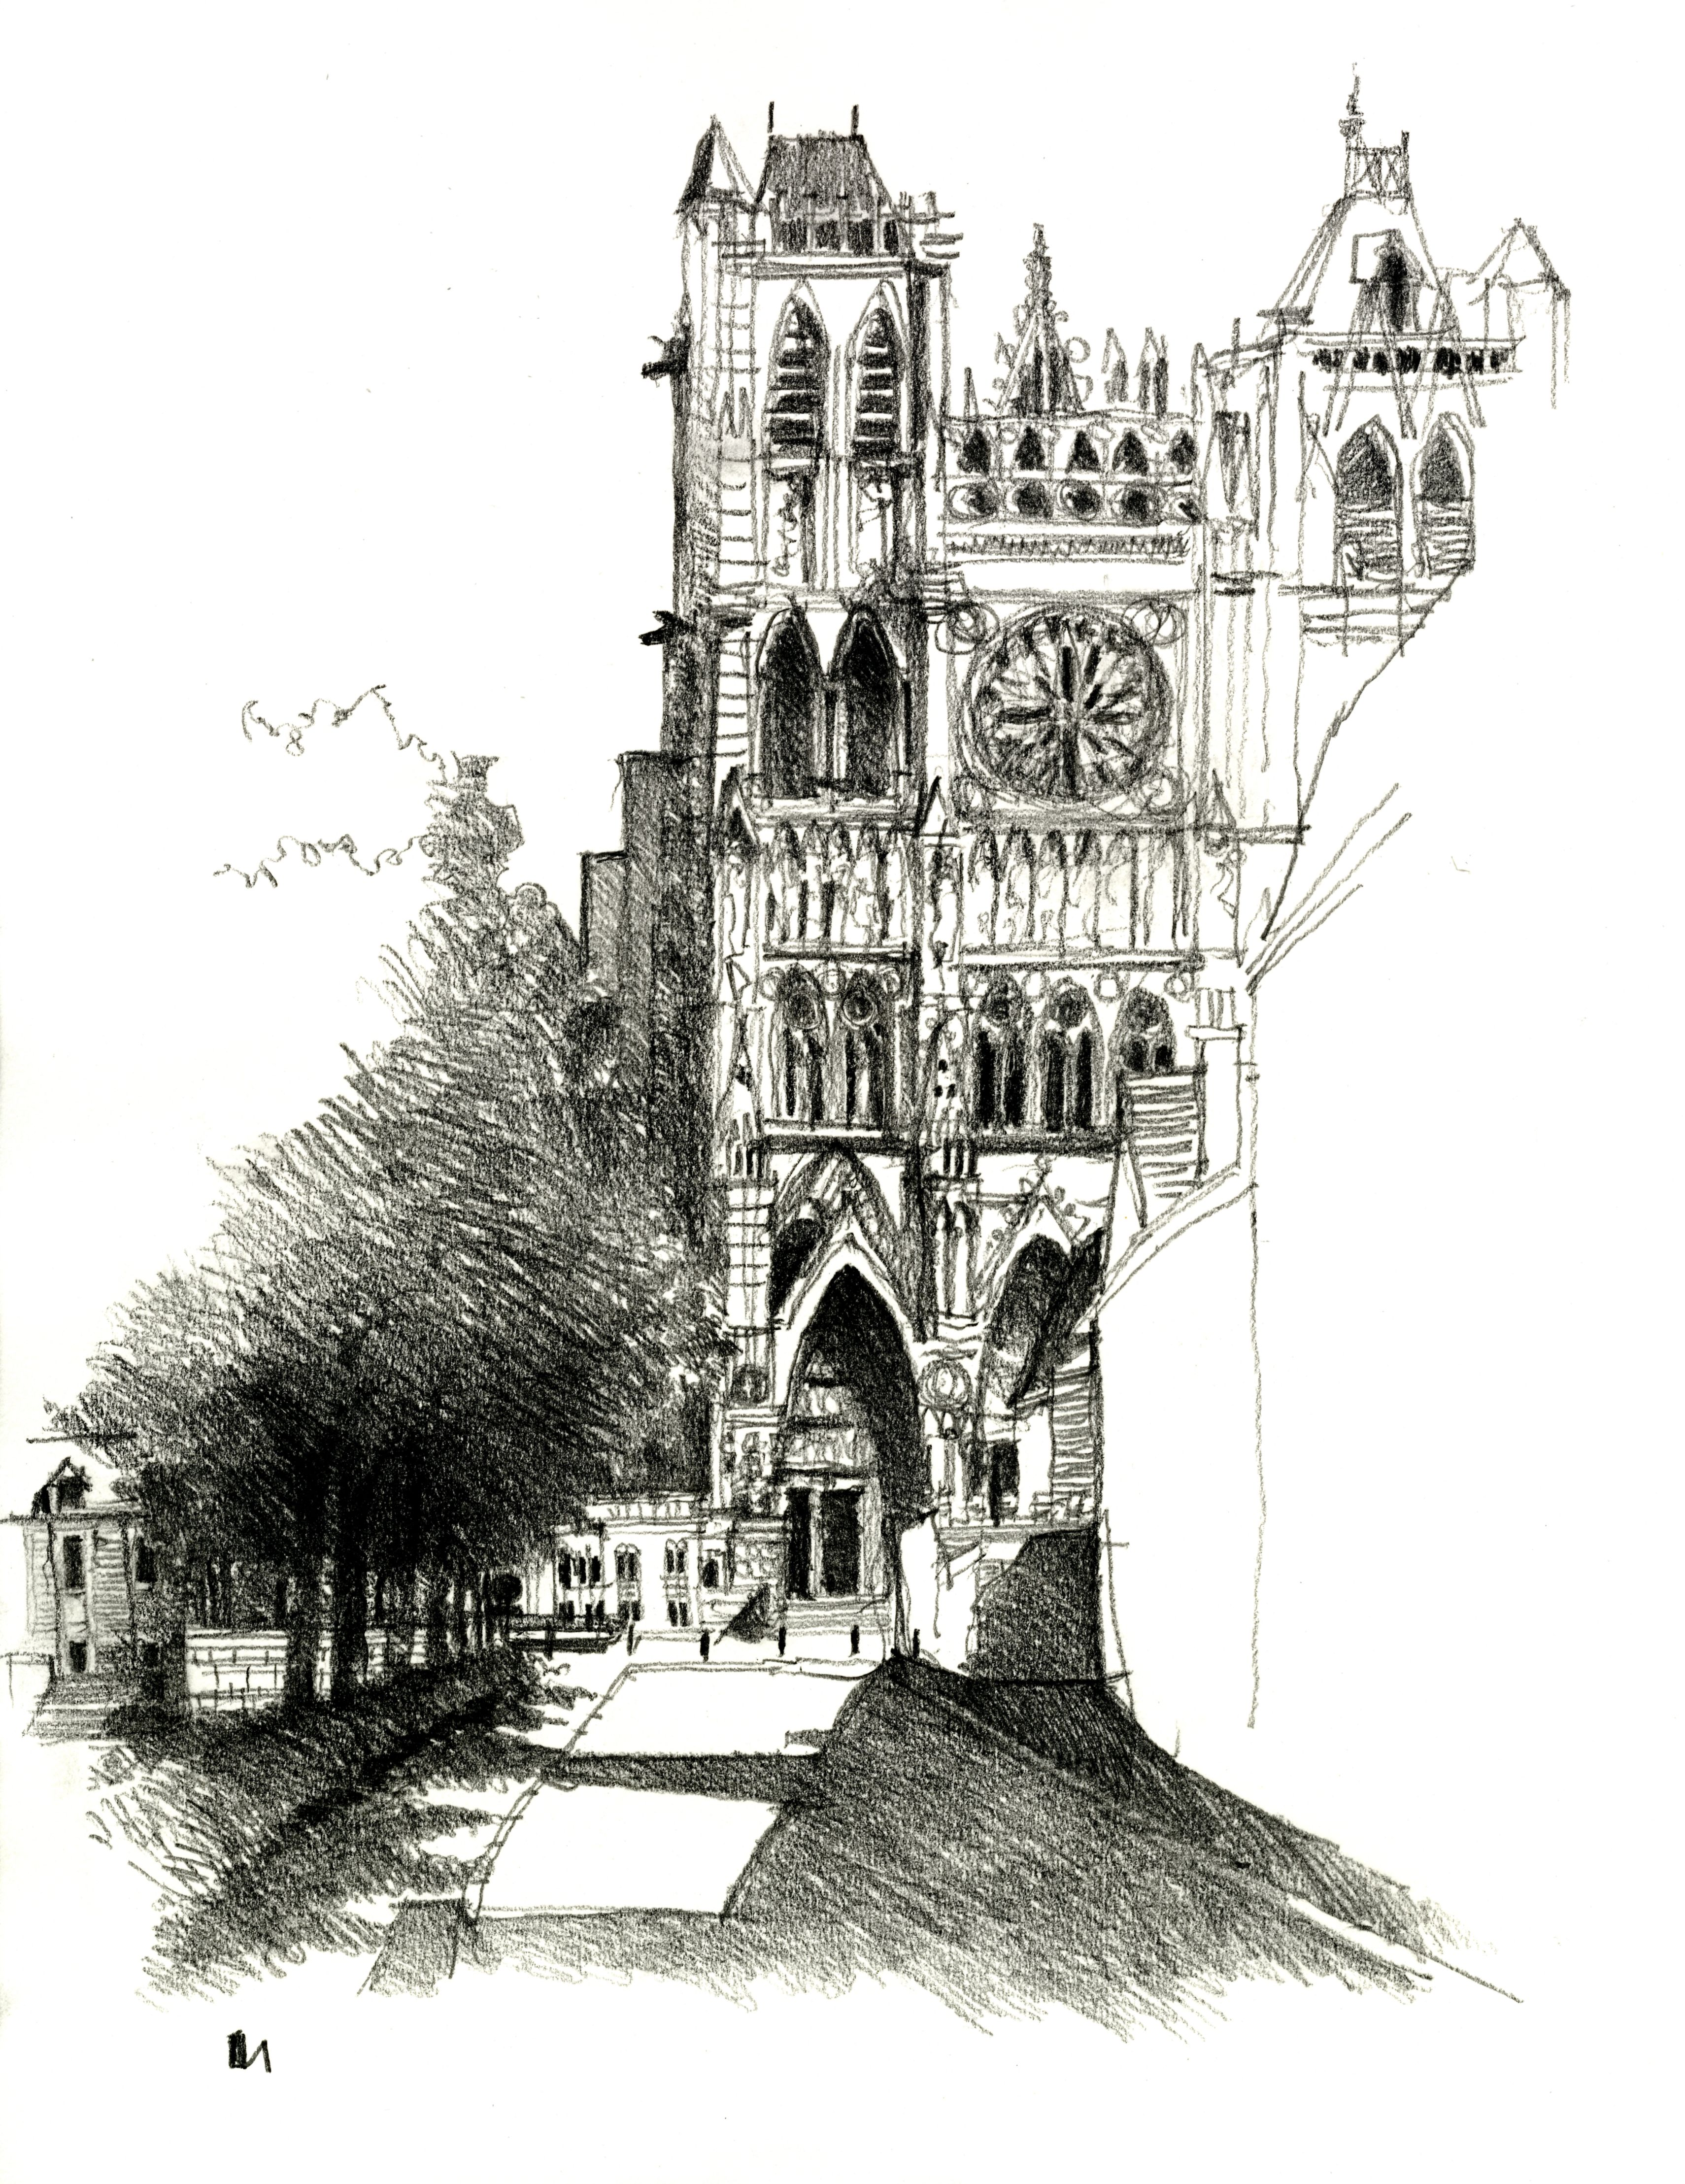 Cathedrale Amiens 5 Cathedrale Amiens Amiens Cathedrale